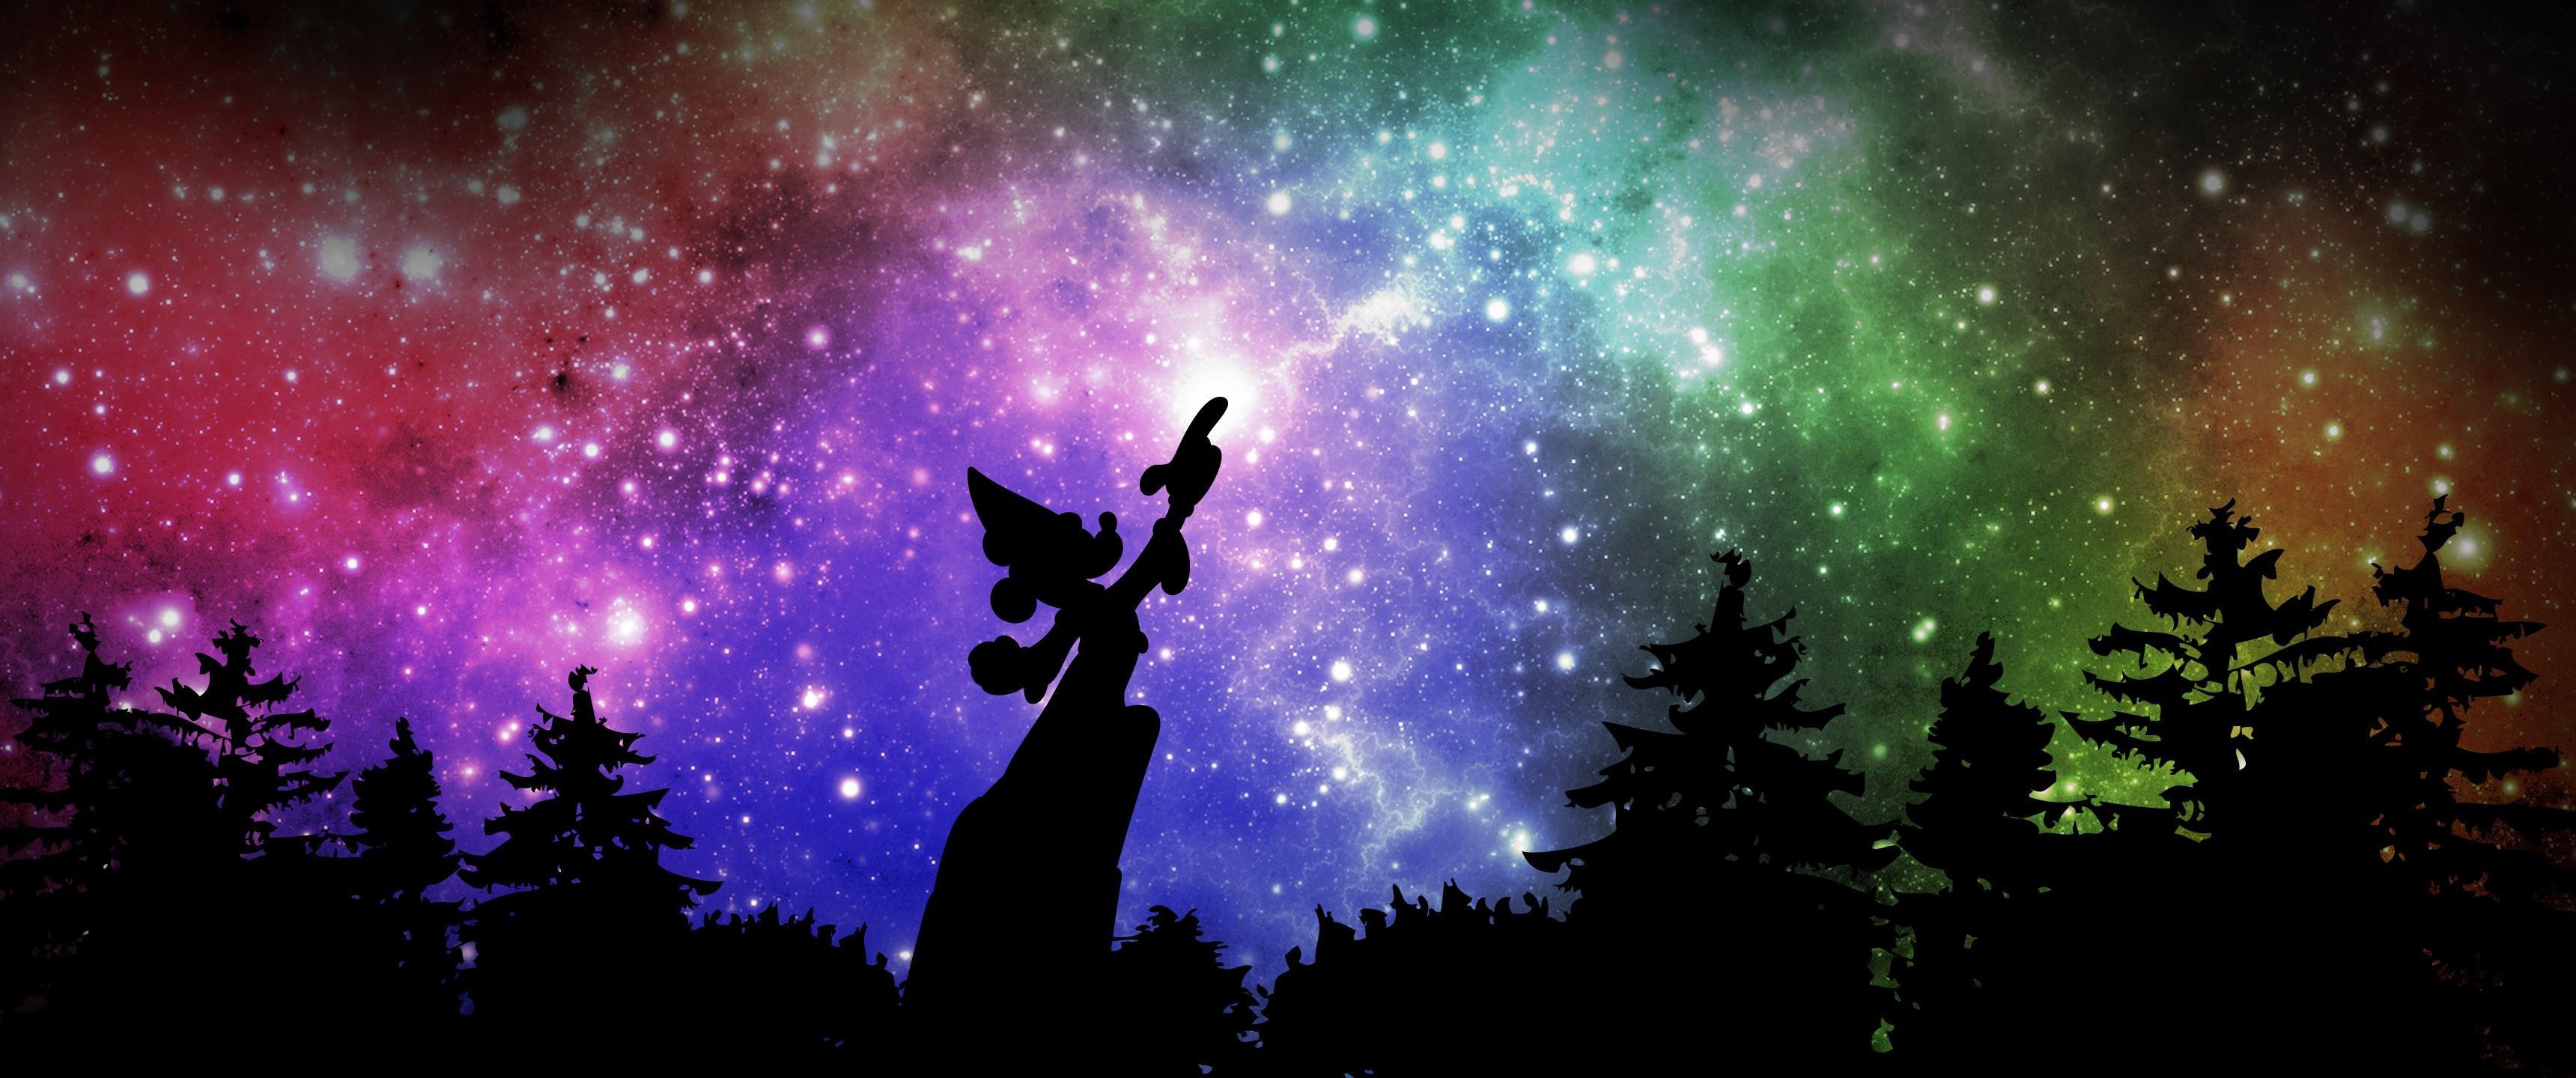 Fireworks Live Wallpaper Iphone Sorcerer Mickey From Fantasmic 3440x1440